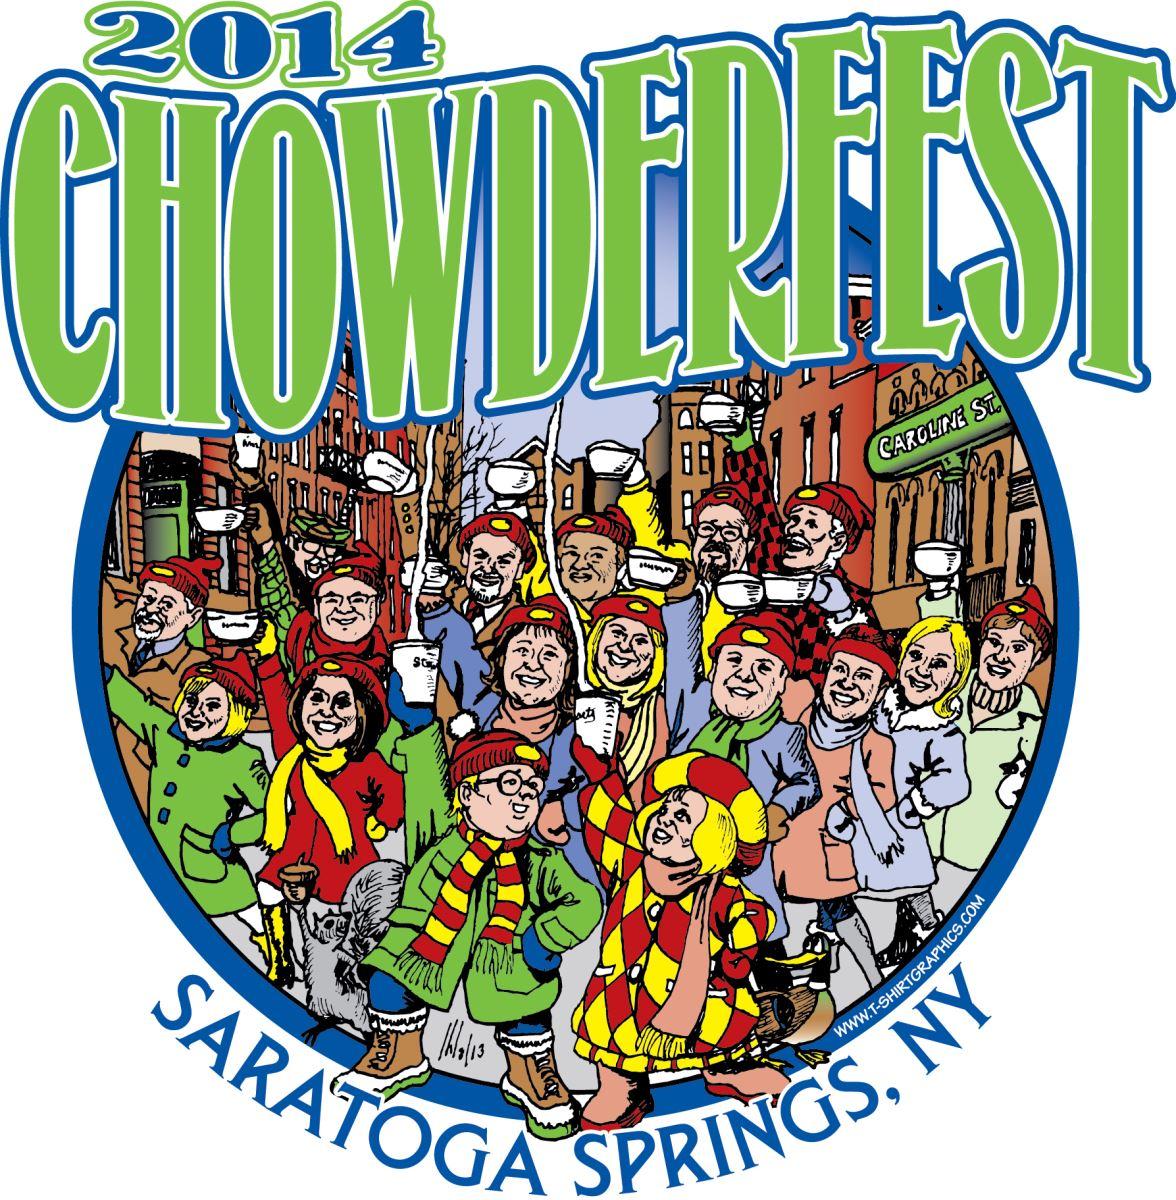 Chowderfest 2014 Logo